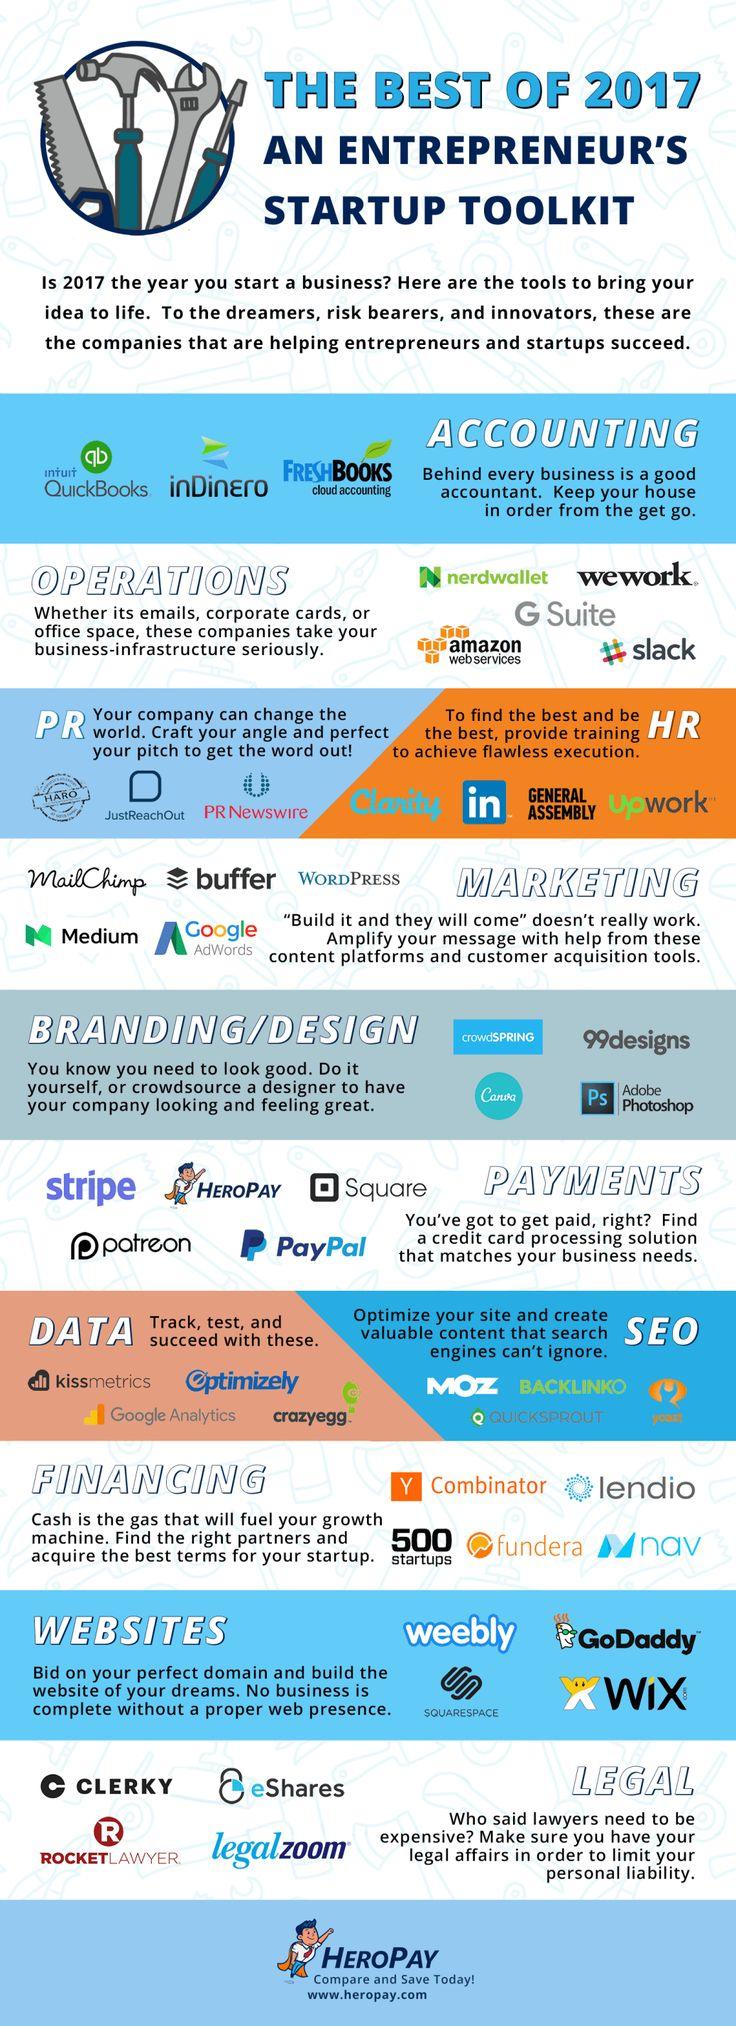 An Entrepreneur's Startup Toolkit (Infographic